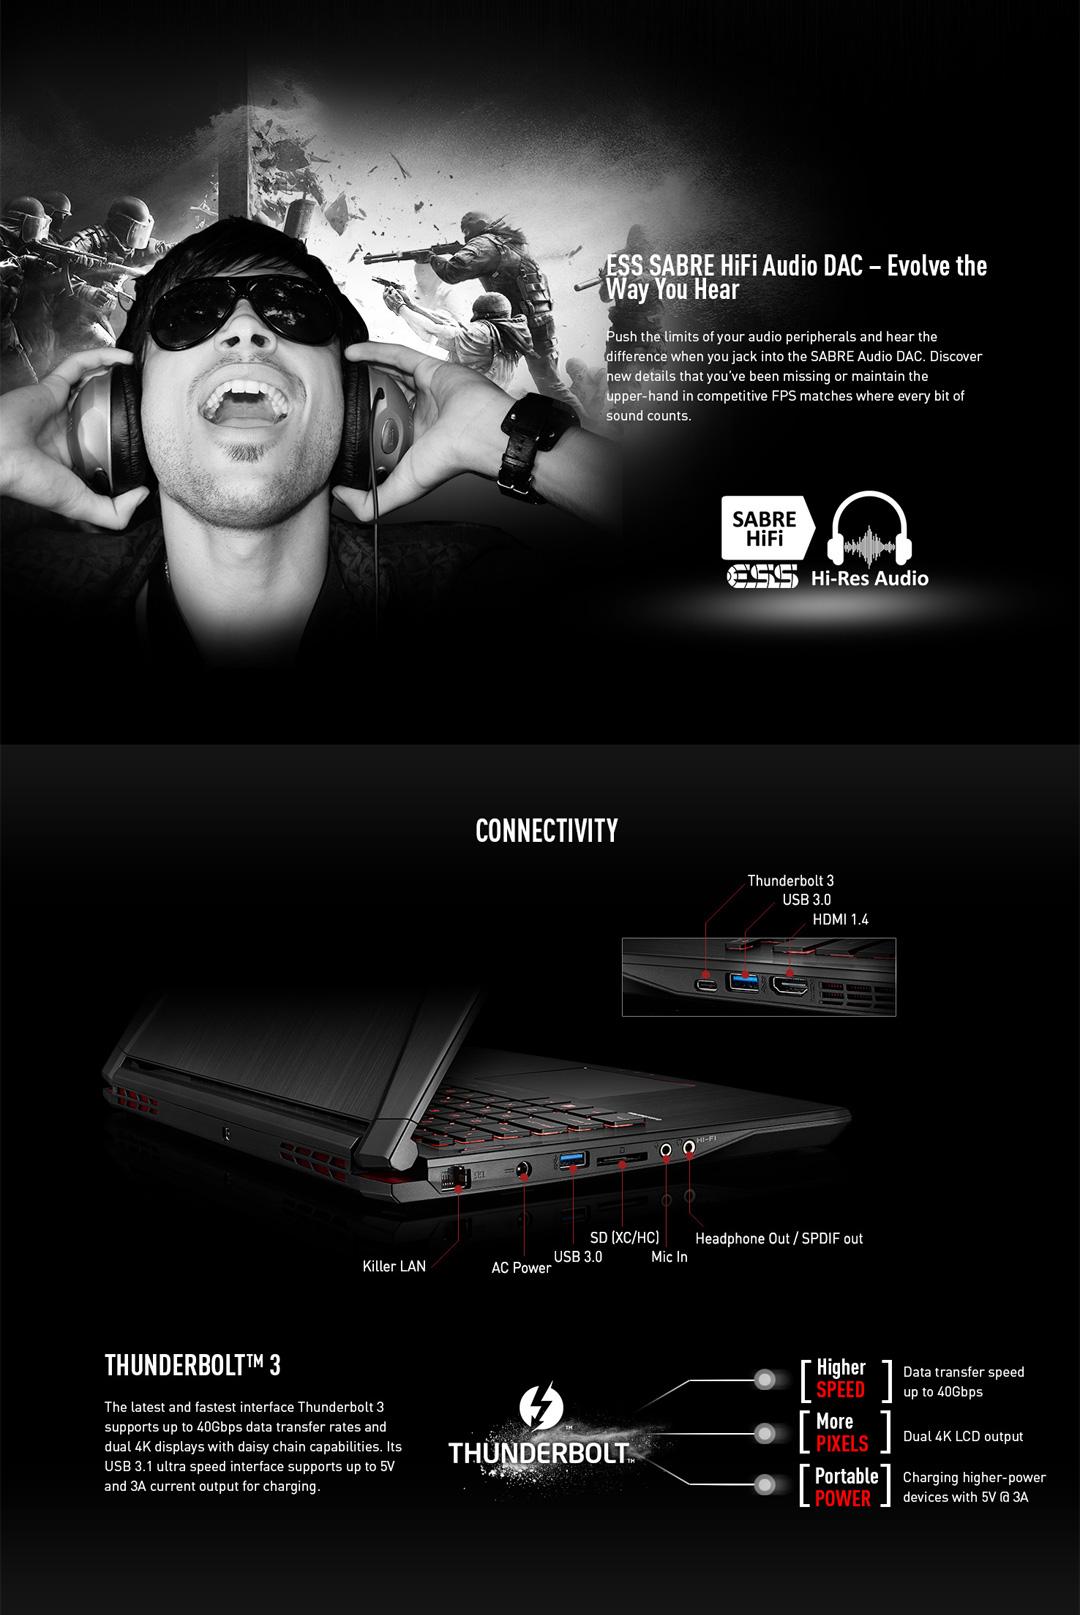 MSI GS43VR Phantom Pro-069 nVidia GTX 1060 Desktop GPU 6GB GDDR5, 7th Gen  Intel Core i7